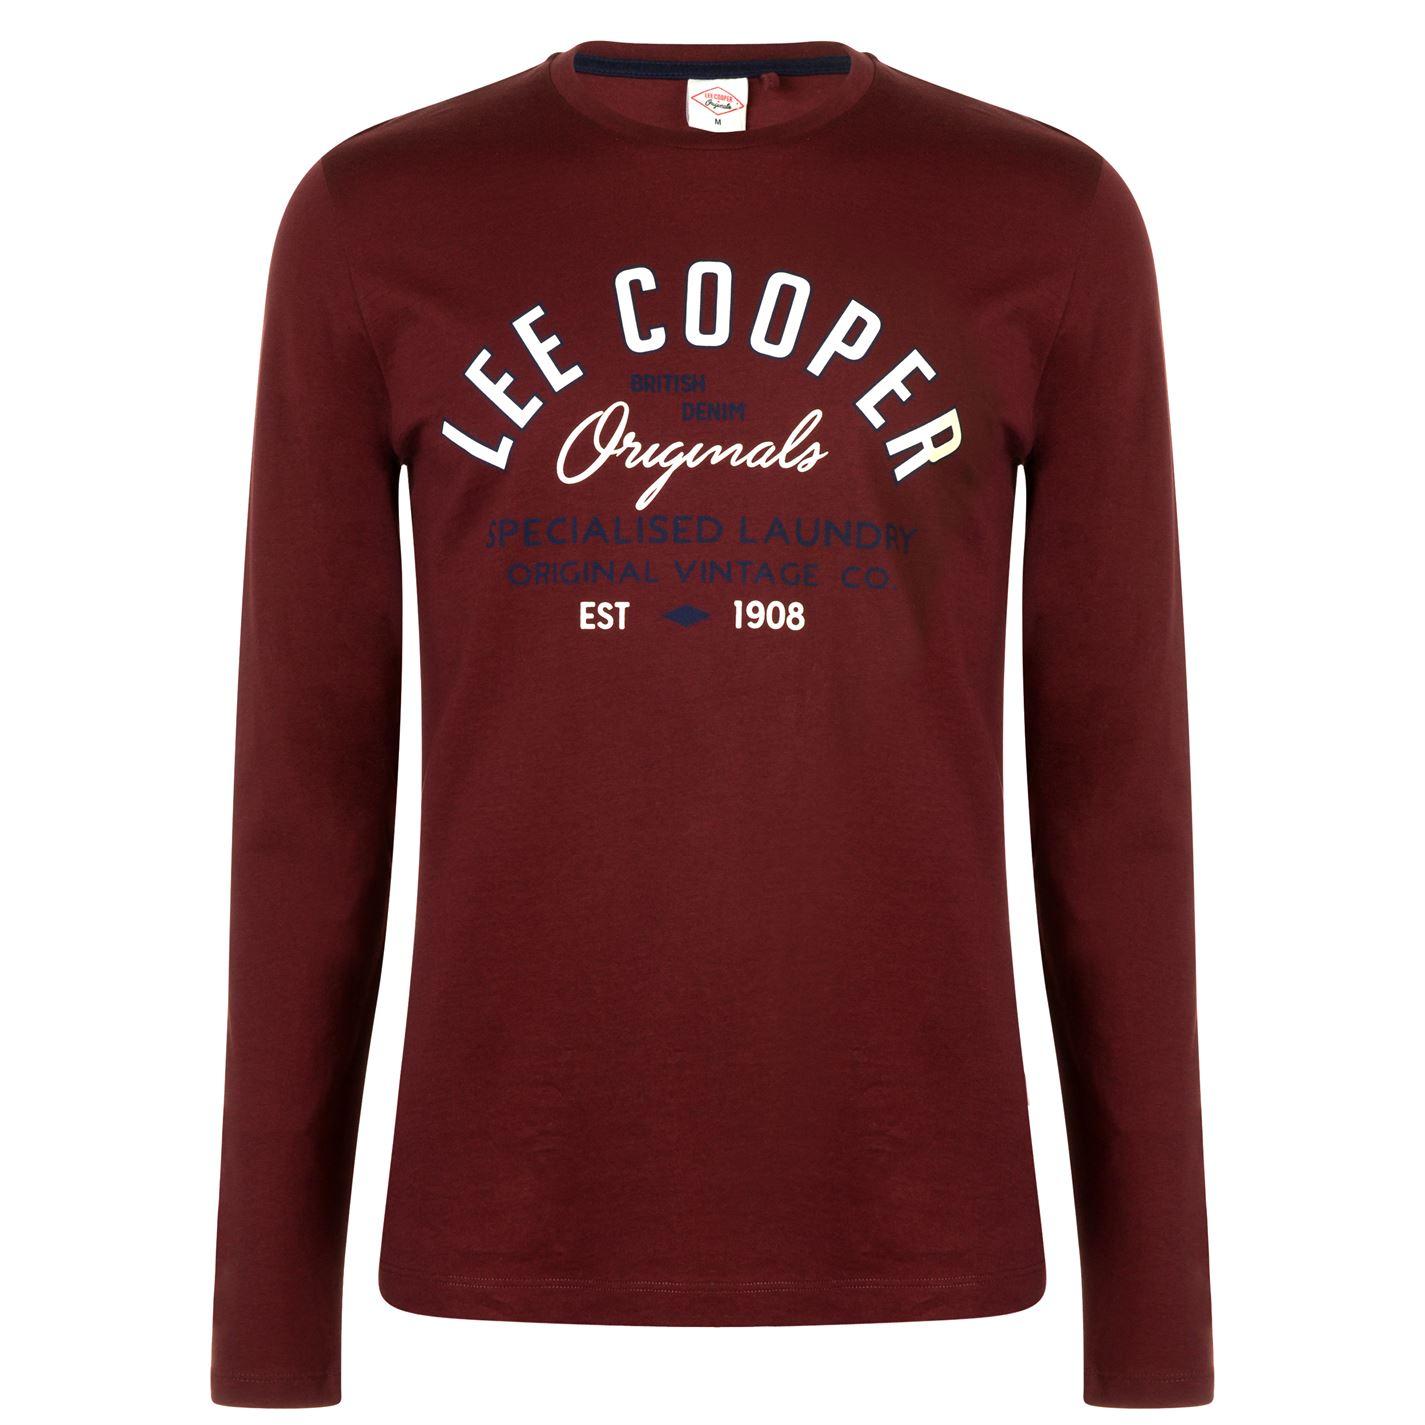 Lee Cooper Long Sleeve Vintage T Shirt